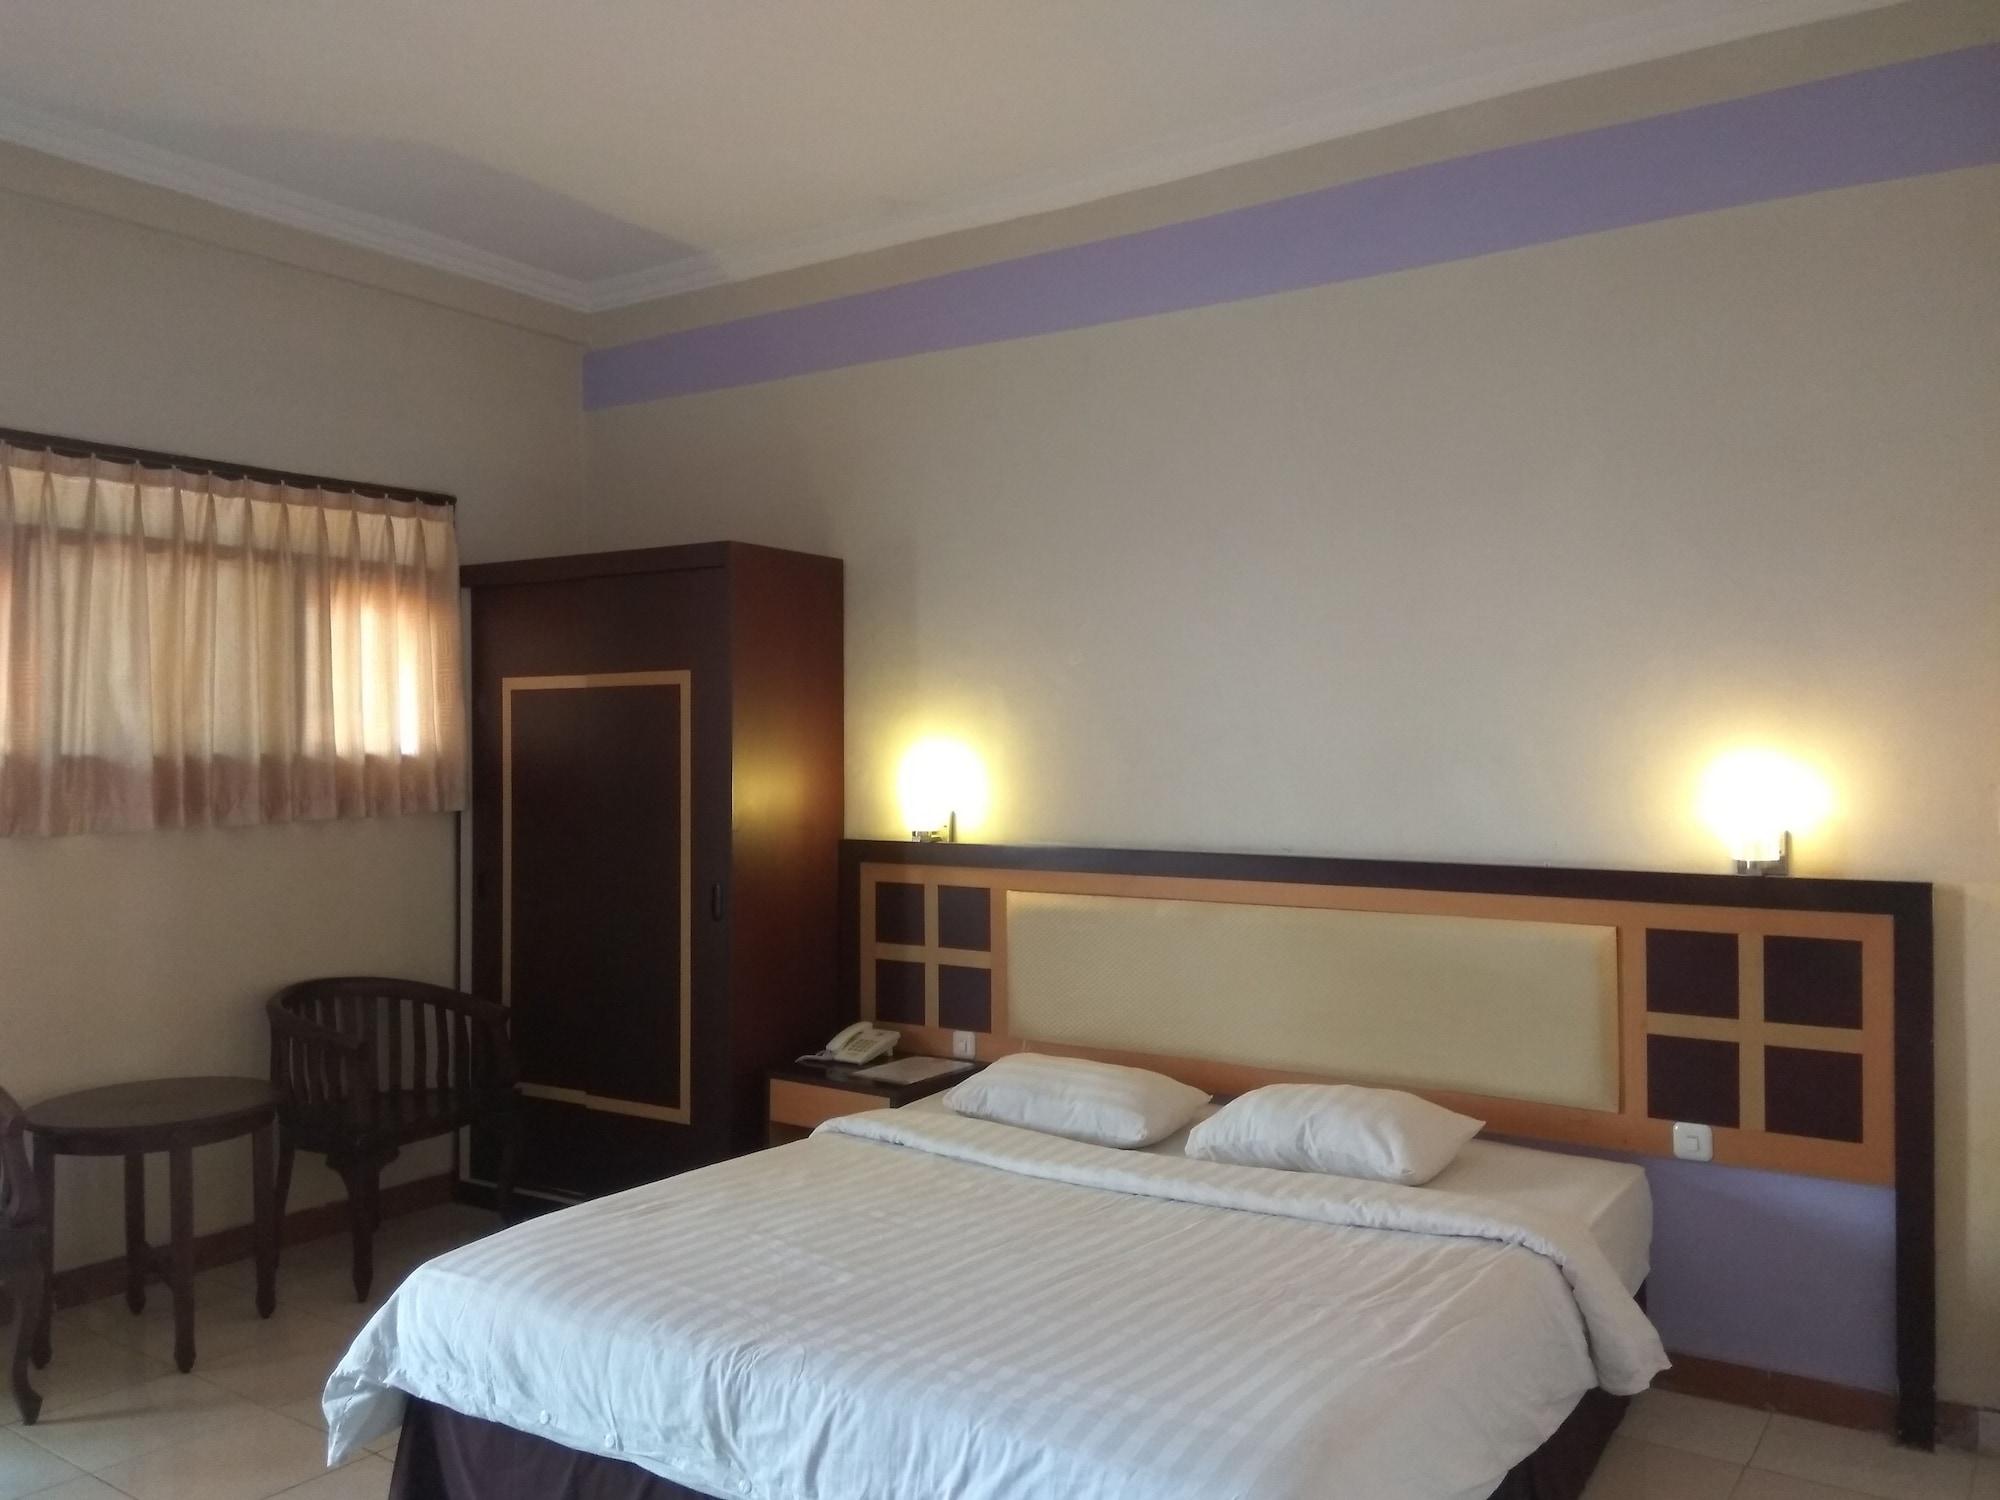 Graha Hotel, Sragen